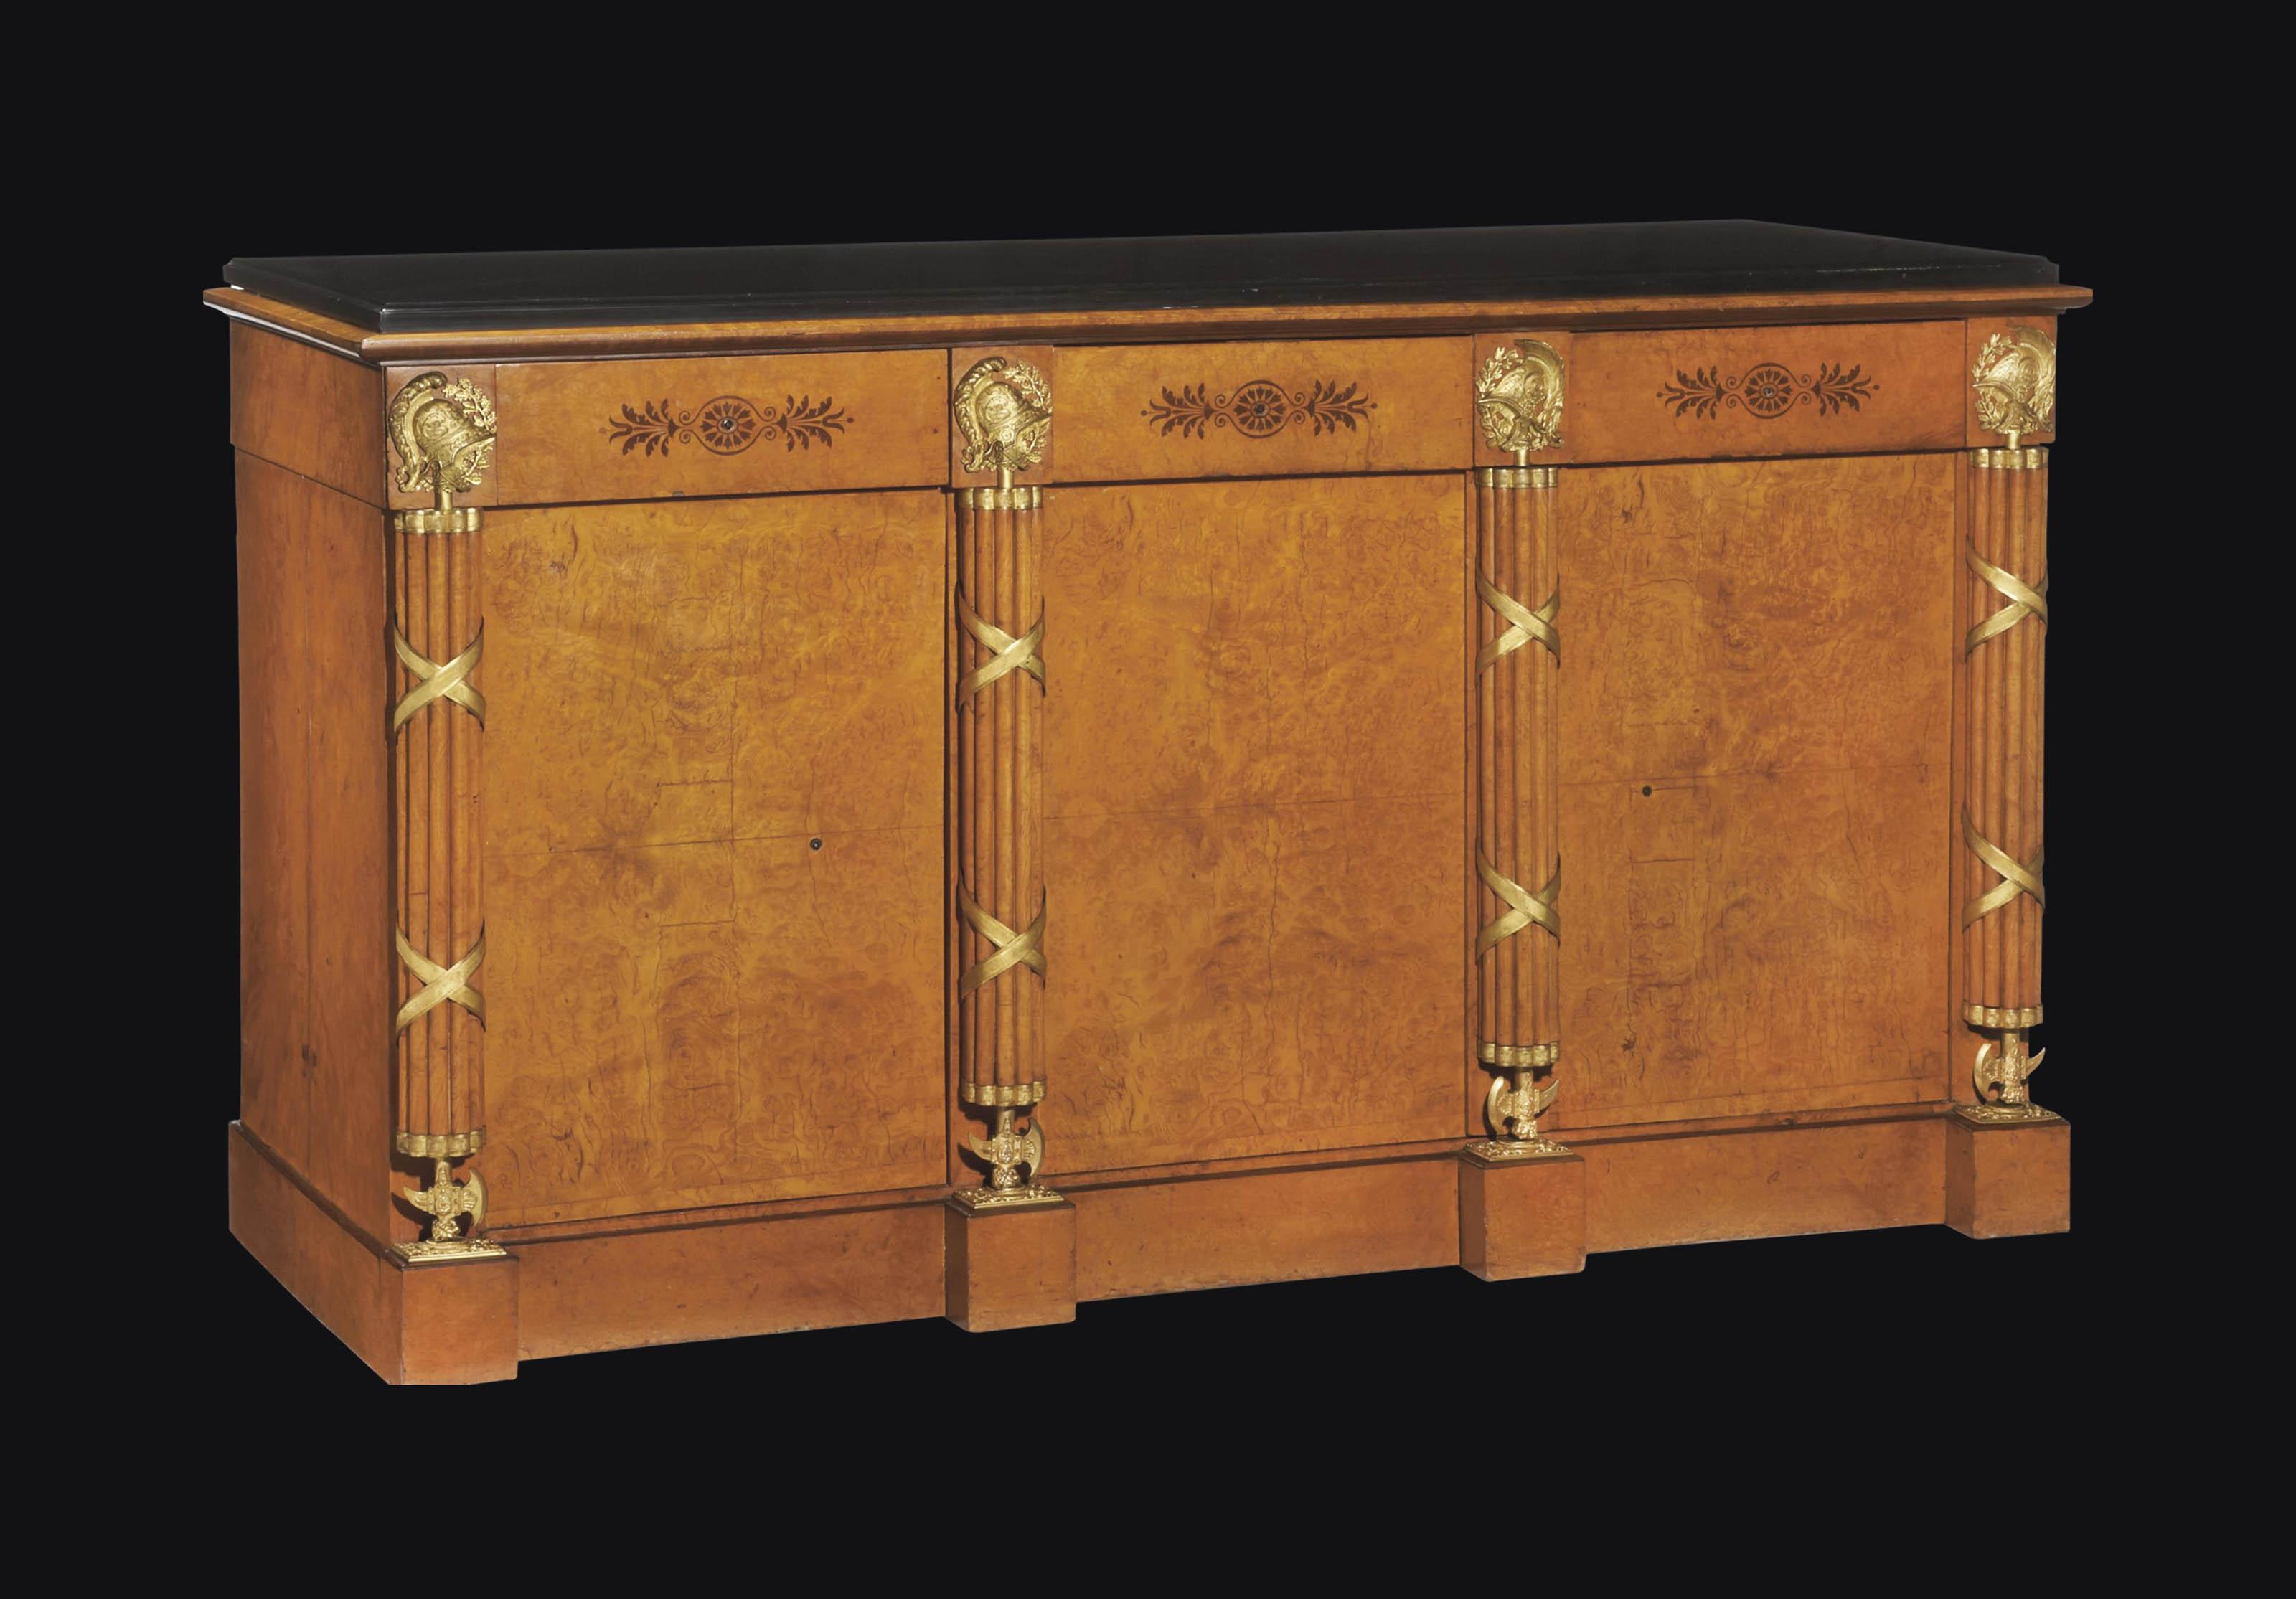 a restauration ormolu mounted burr elm meuble d 39 appui circa 1815 1825 attributed to jean. Black Bedroom Furniture Sets. Home Design Ideas